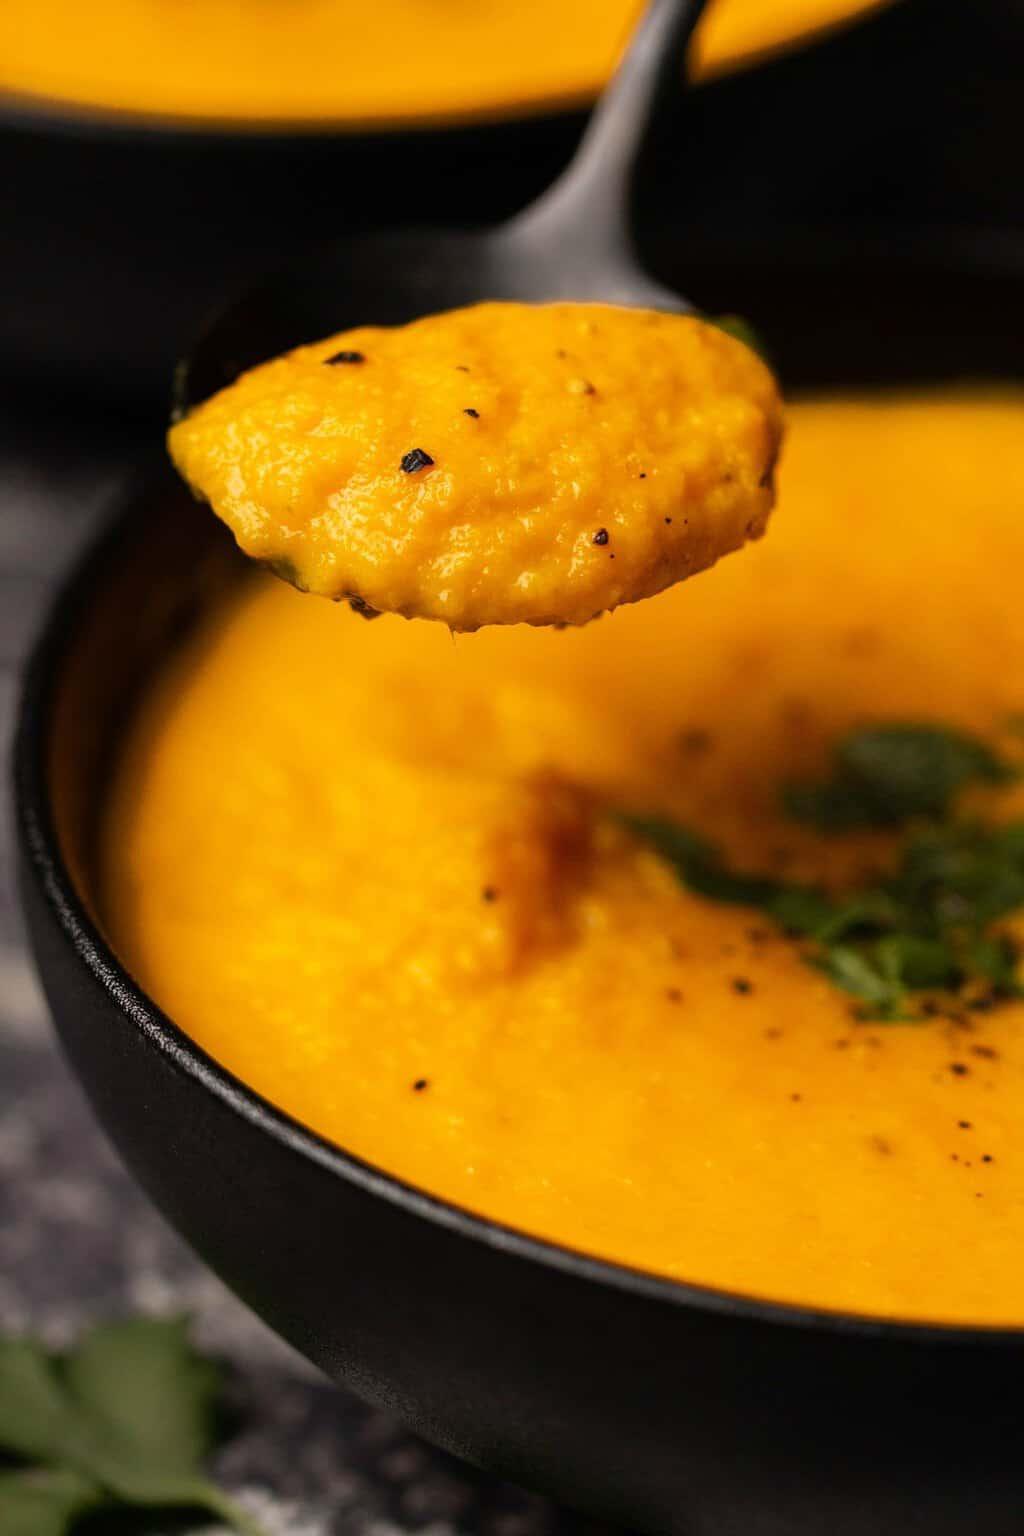 Spoonful of vegan carrot ginger soup.